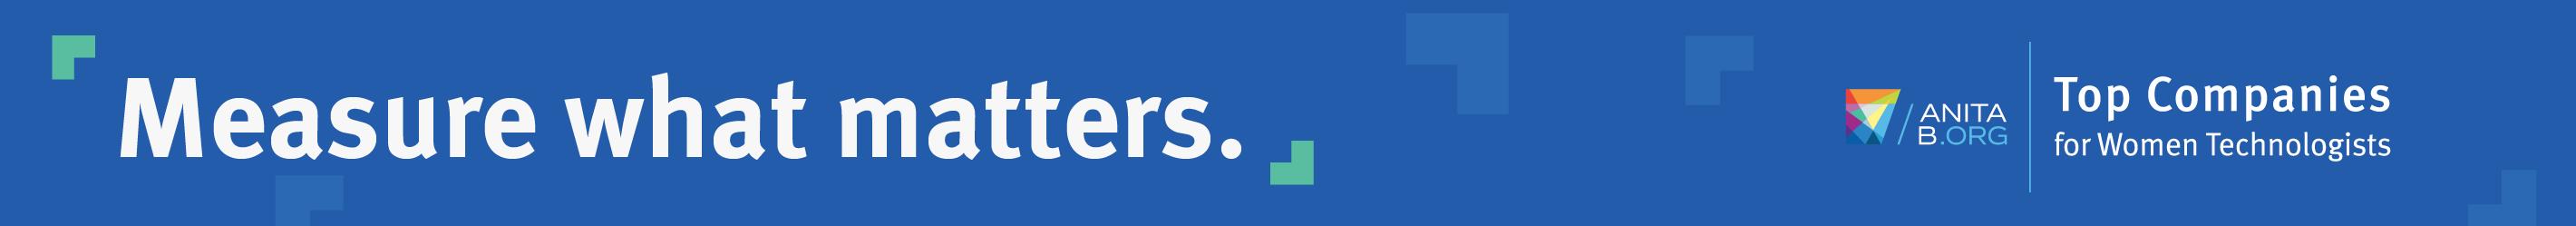 Top Companies Portal Banner